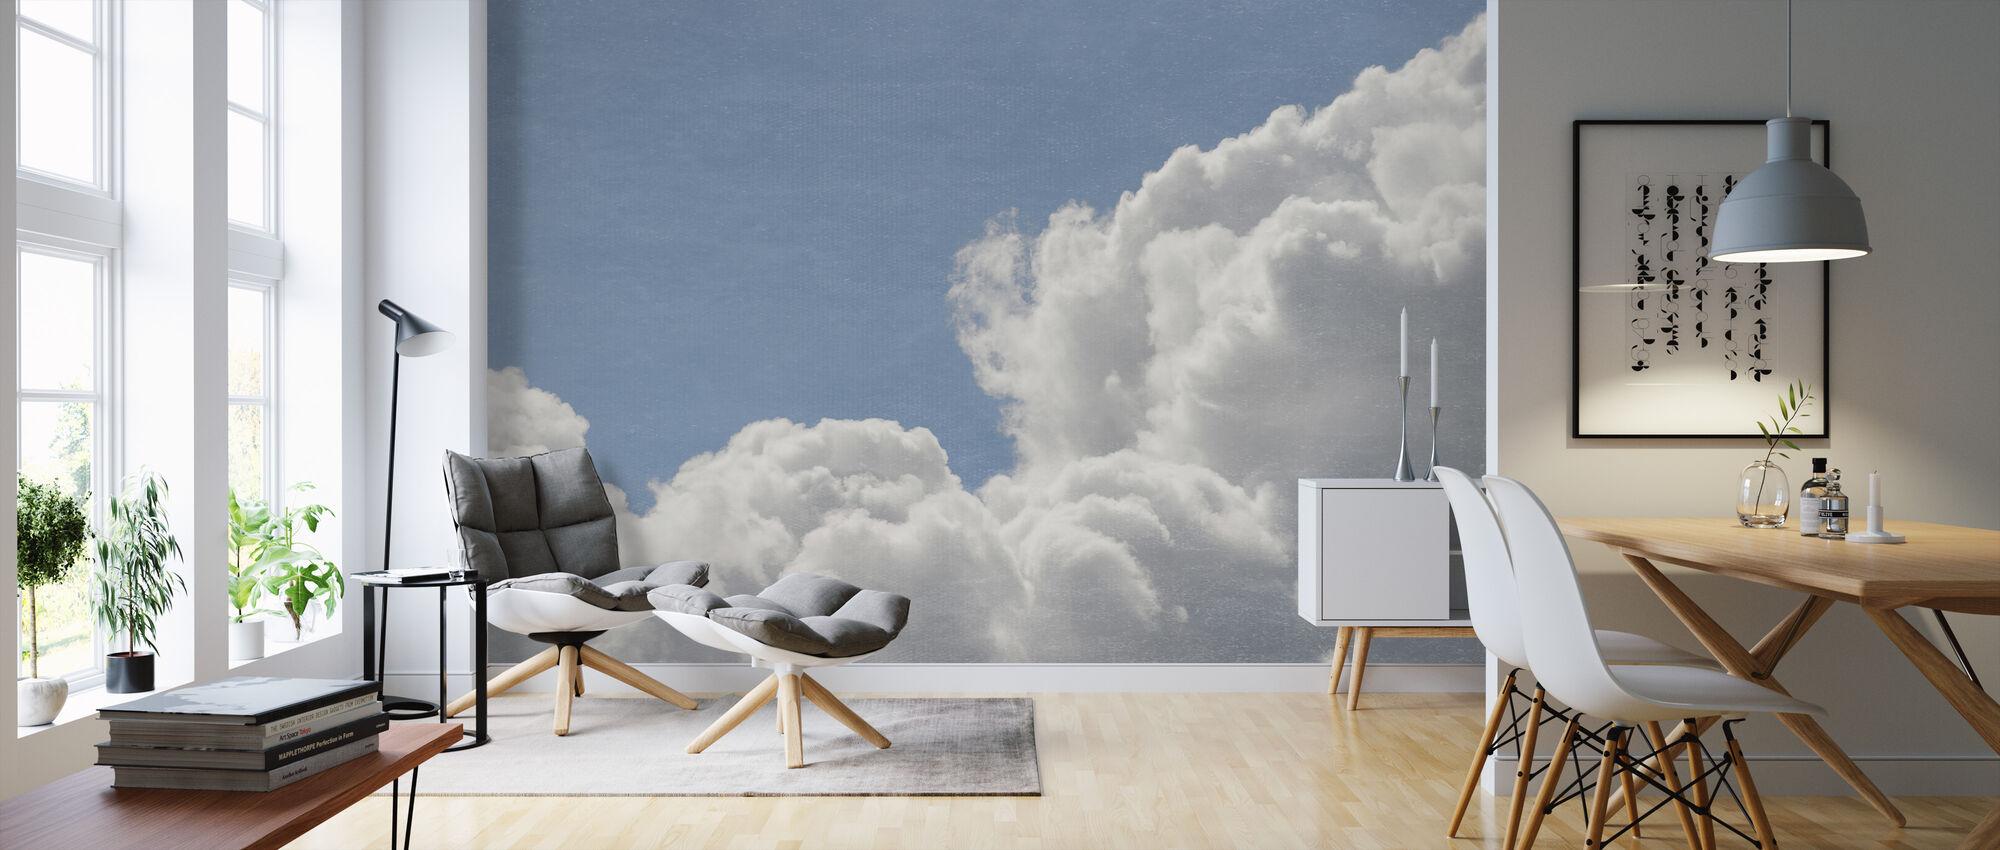 Blush Clouds Filter - Wallpaper - Living Room